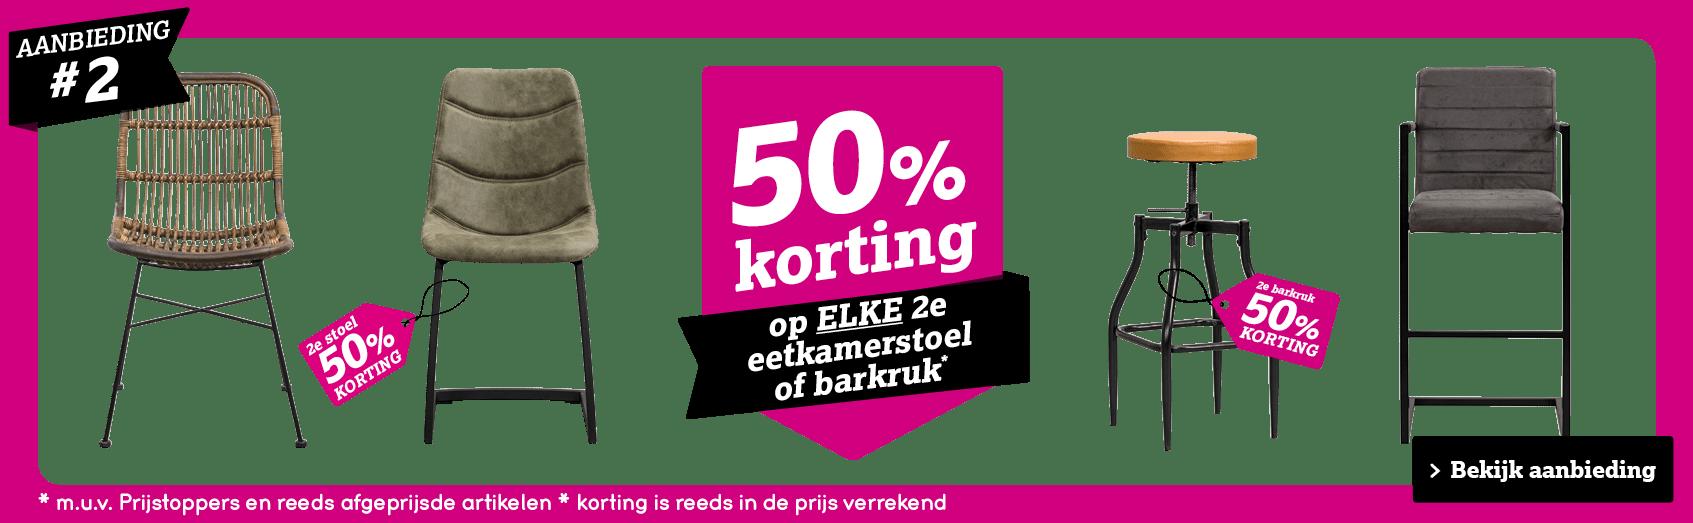 50% korting